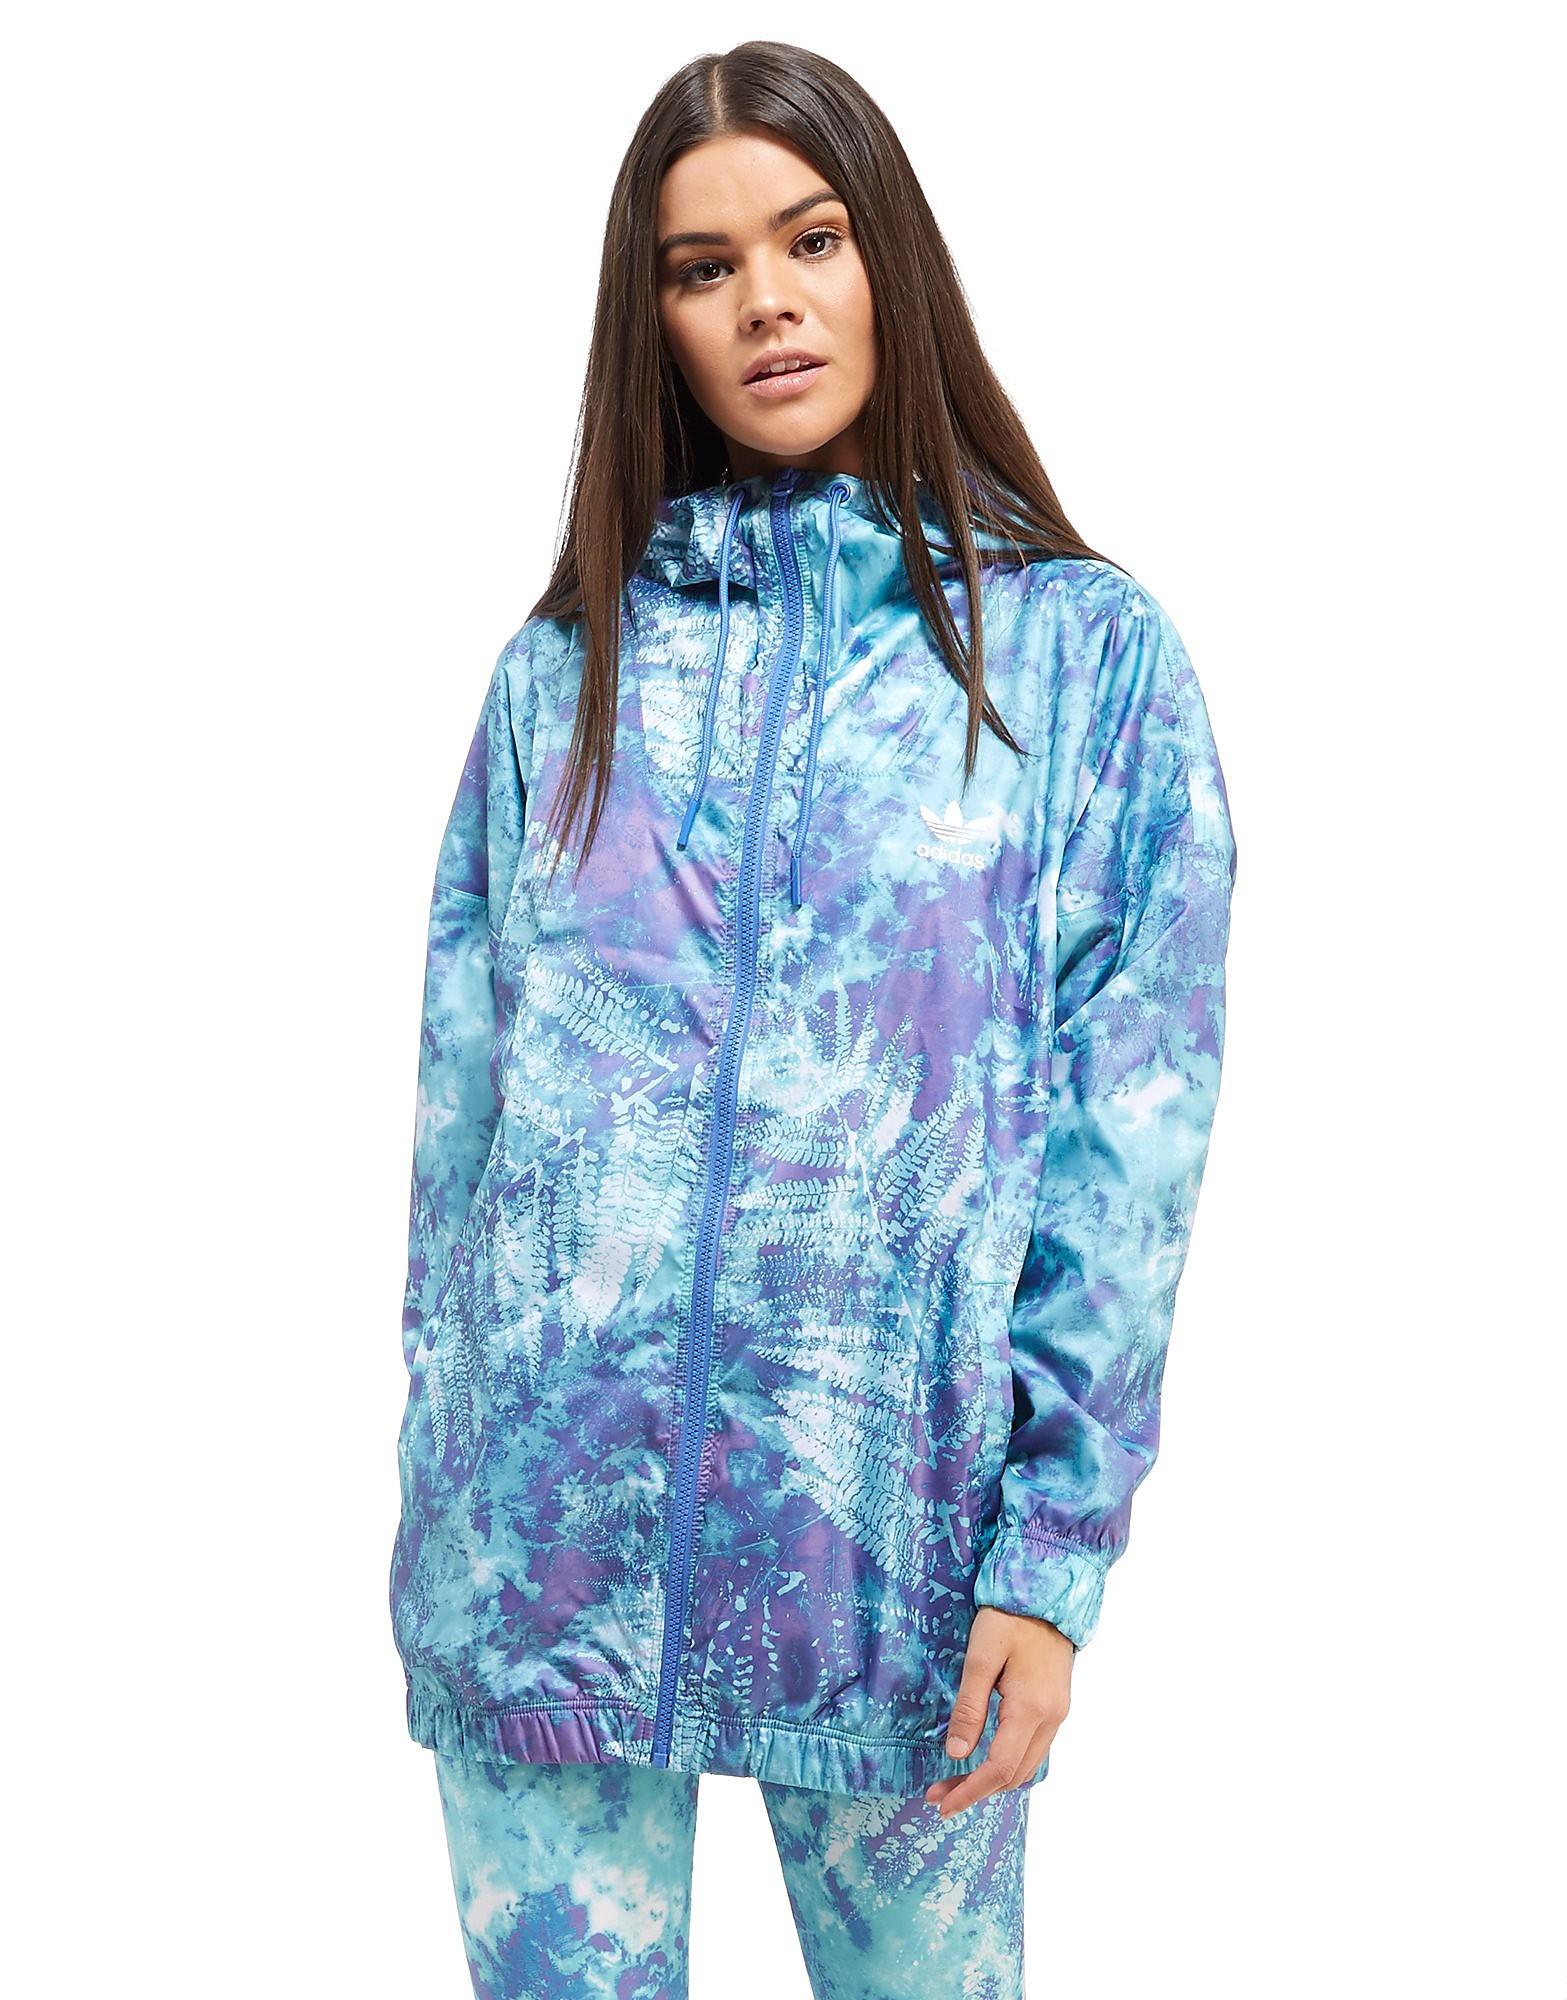 adidas Originals Ocean Elements Windbreaker Jacket